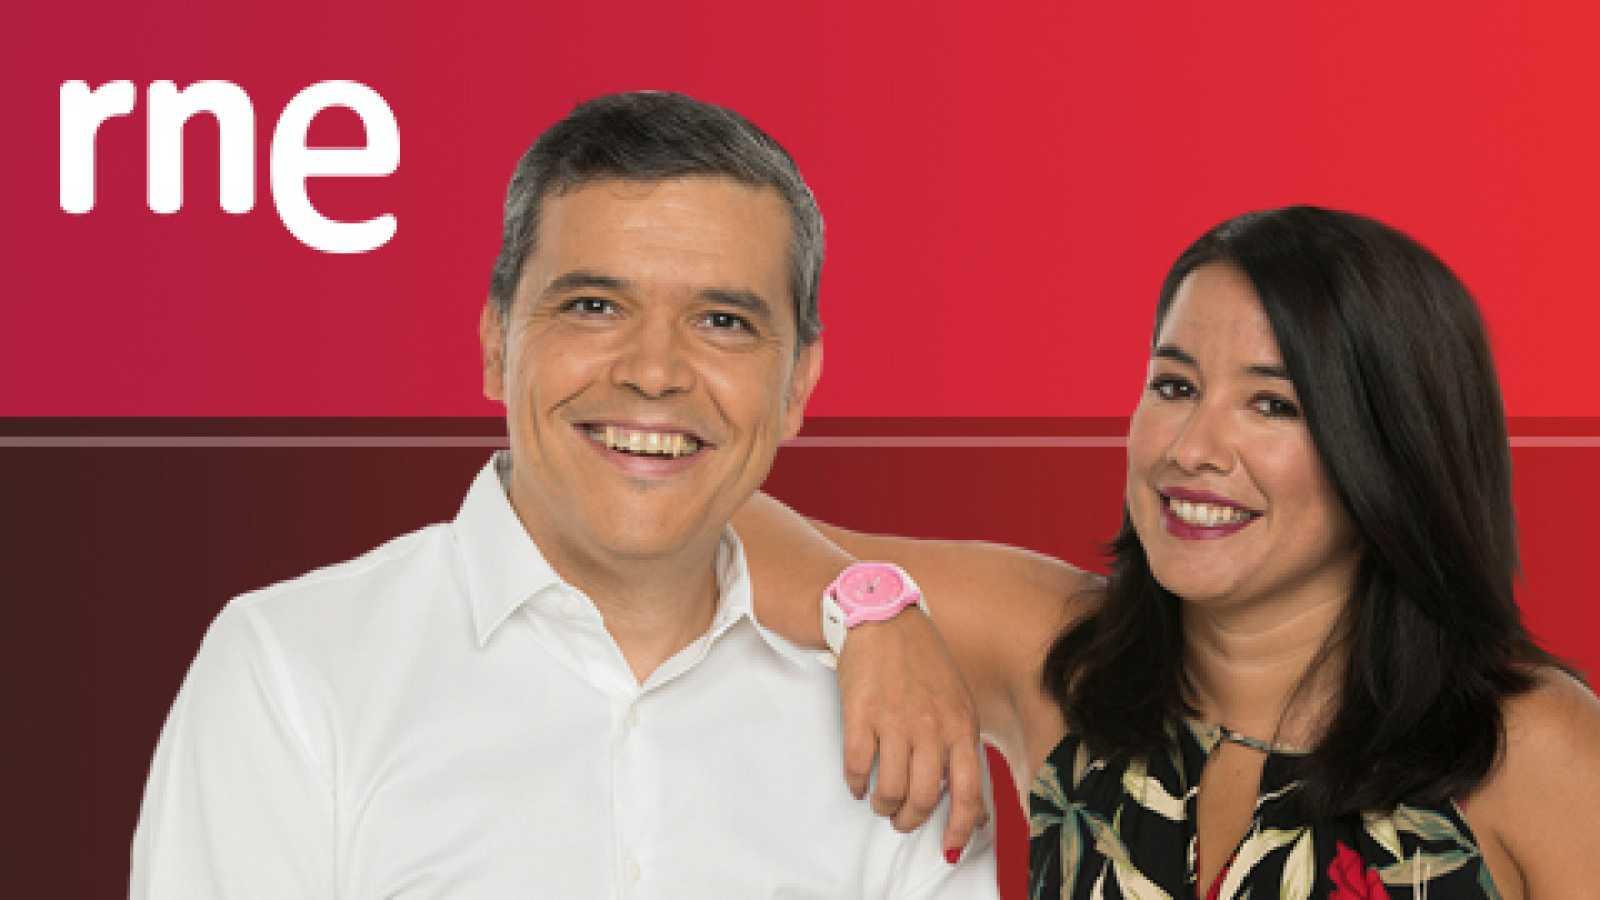 Las mañanas de RNE con Alfredo Menéndez - Segunda hora - 29/08/19 - escuchar ahora